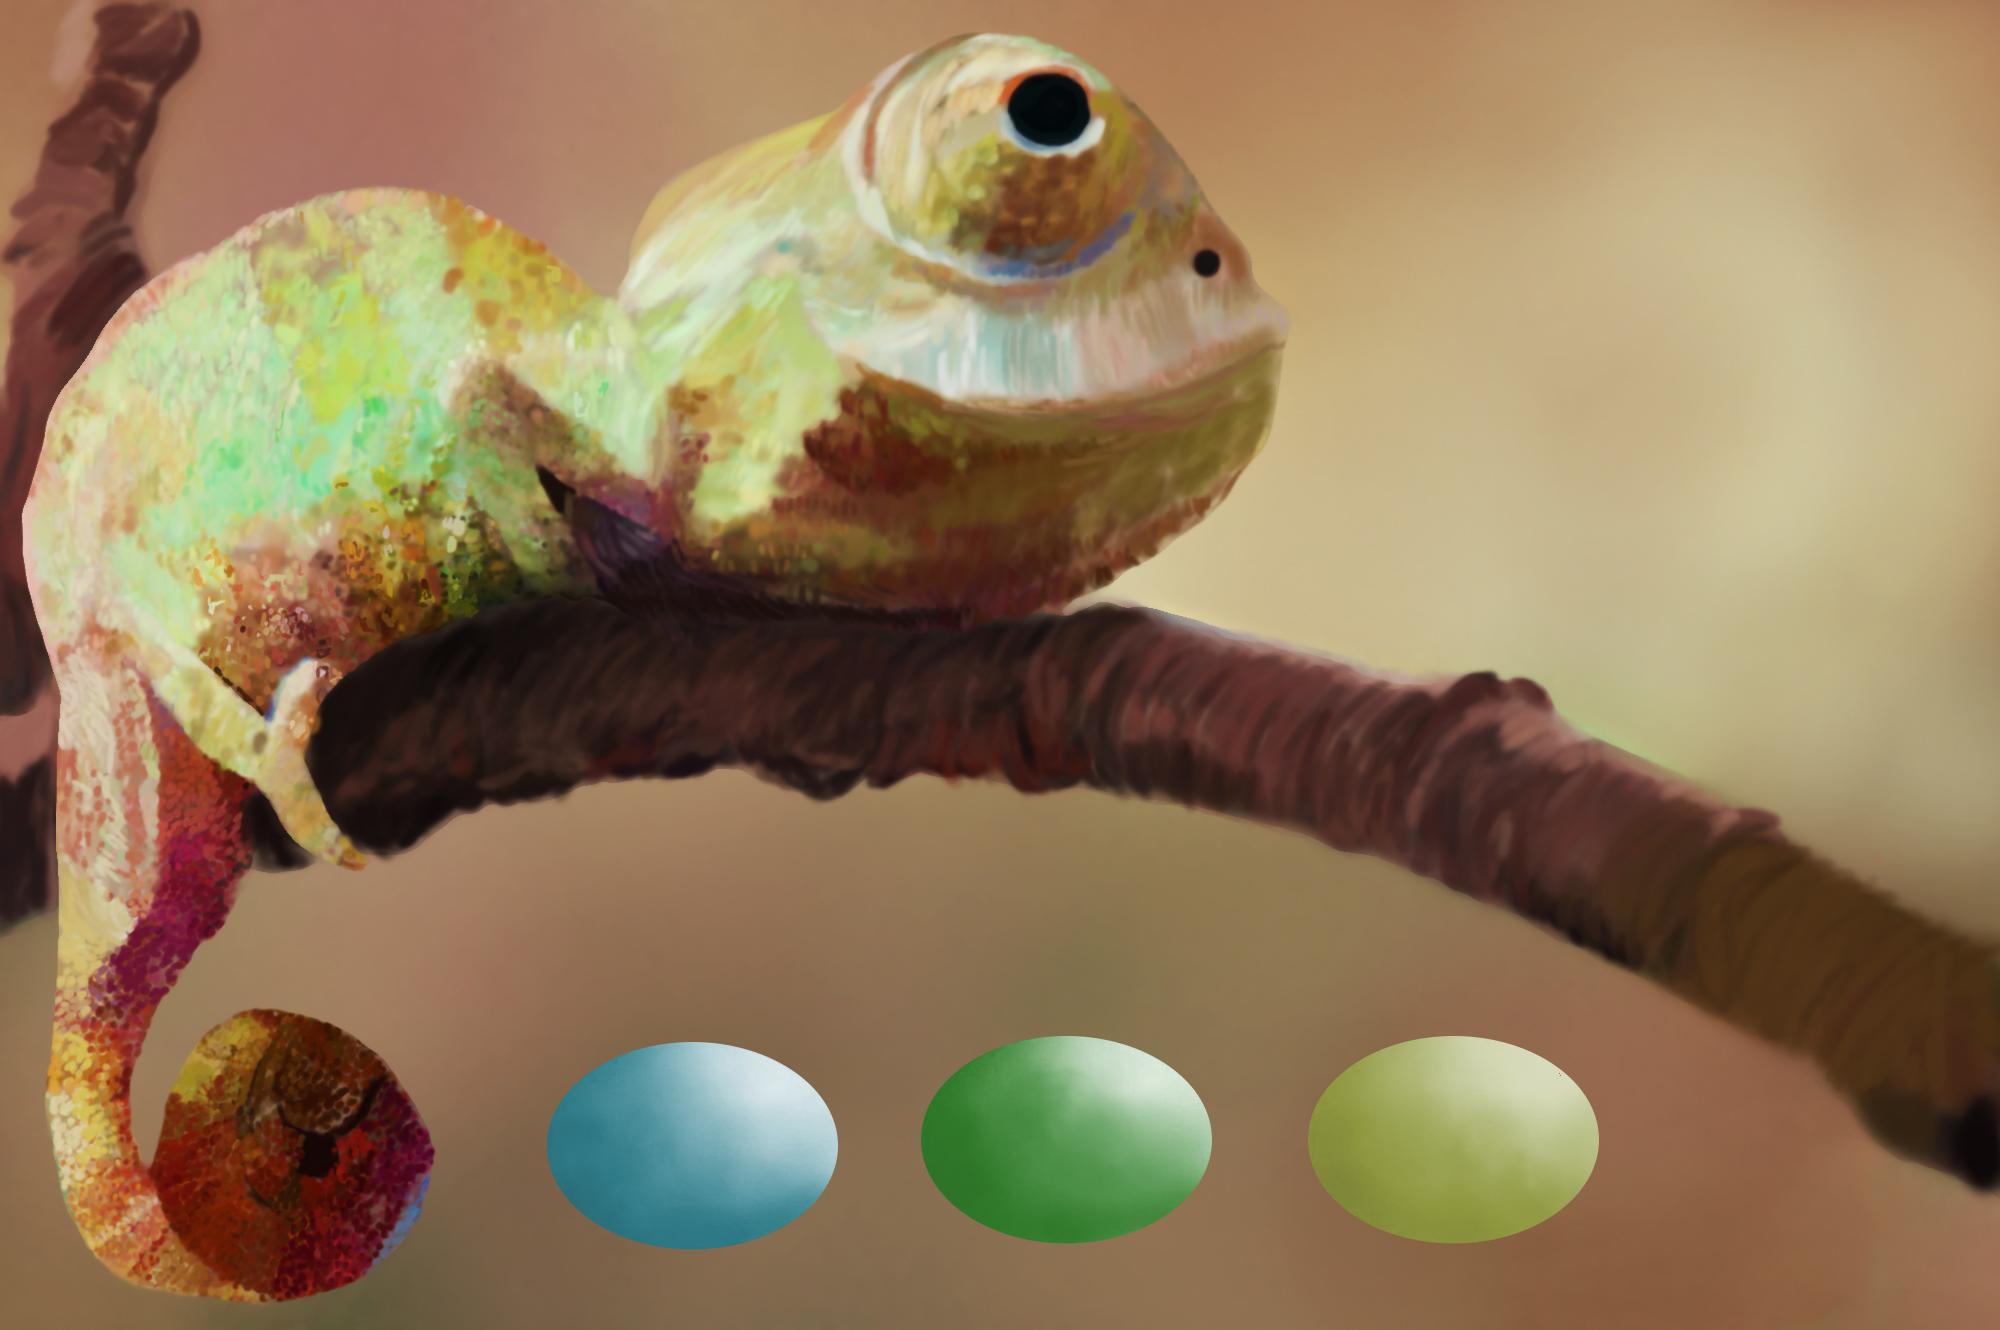 Chameleon Swatches example image 2